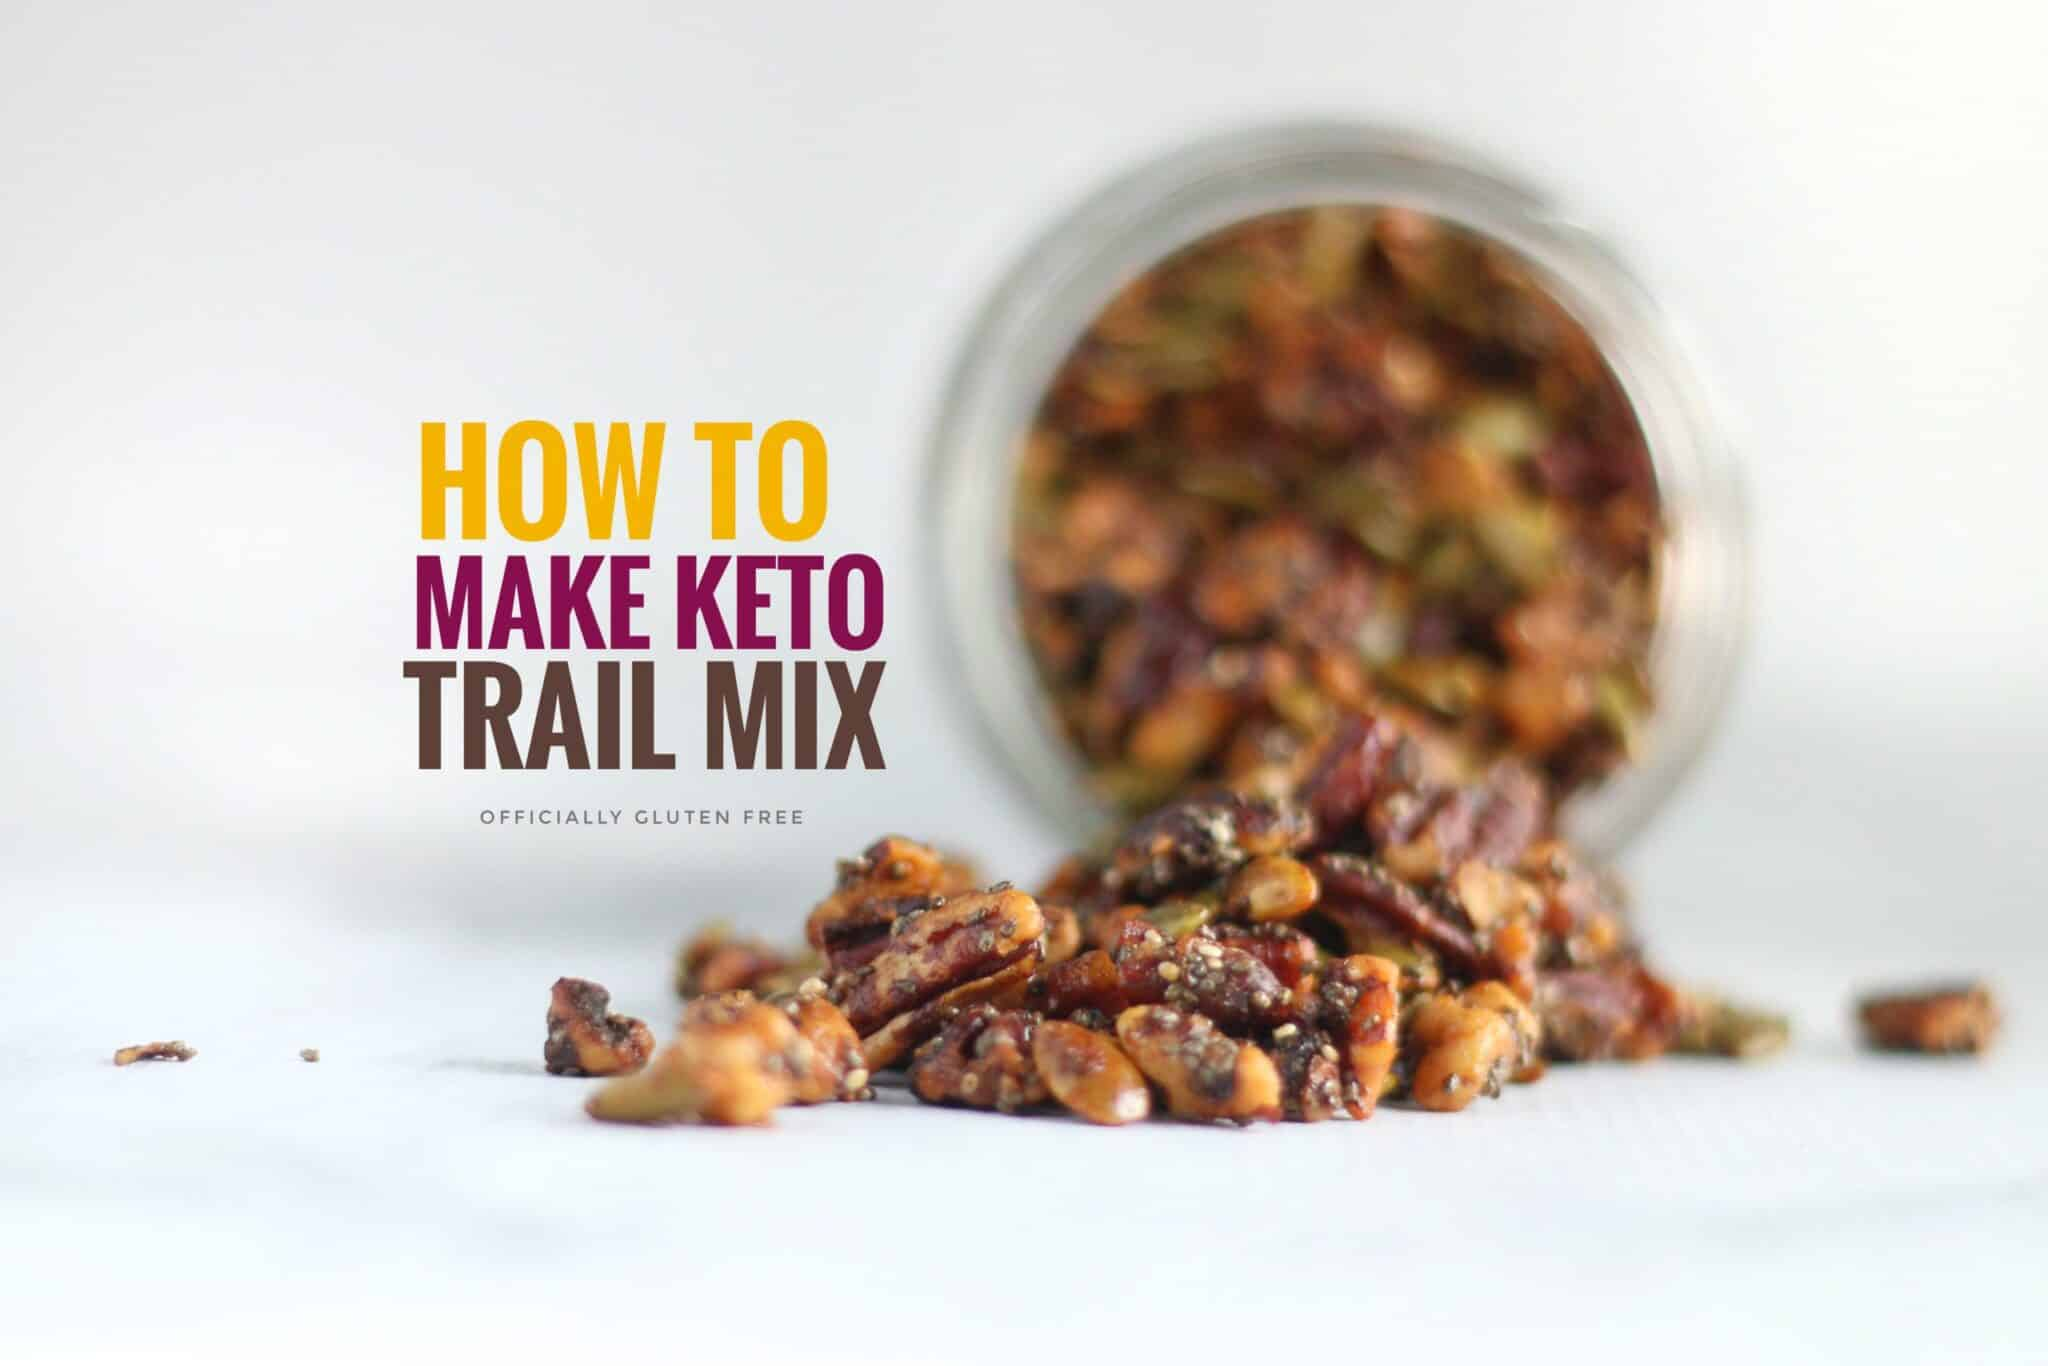 How To Make Keto Trail Mix